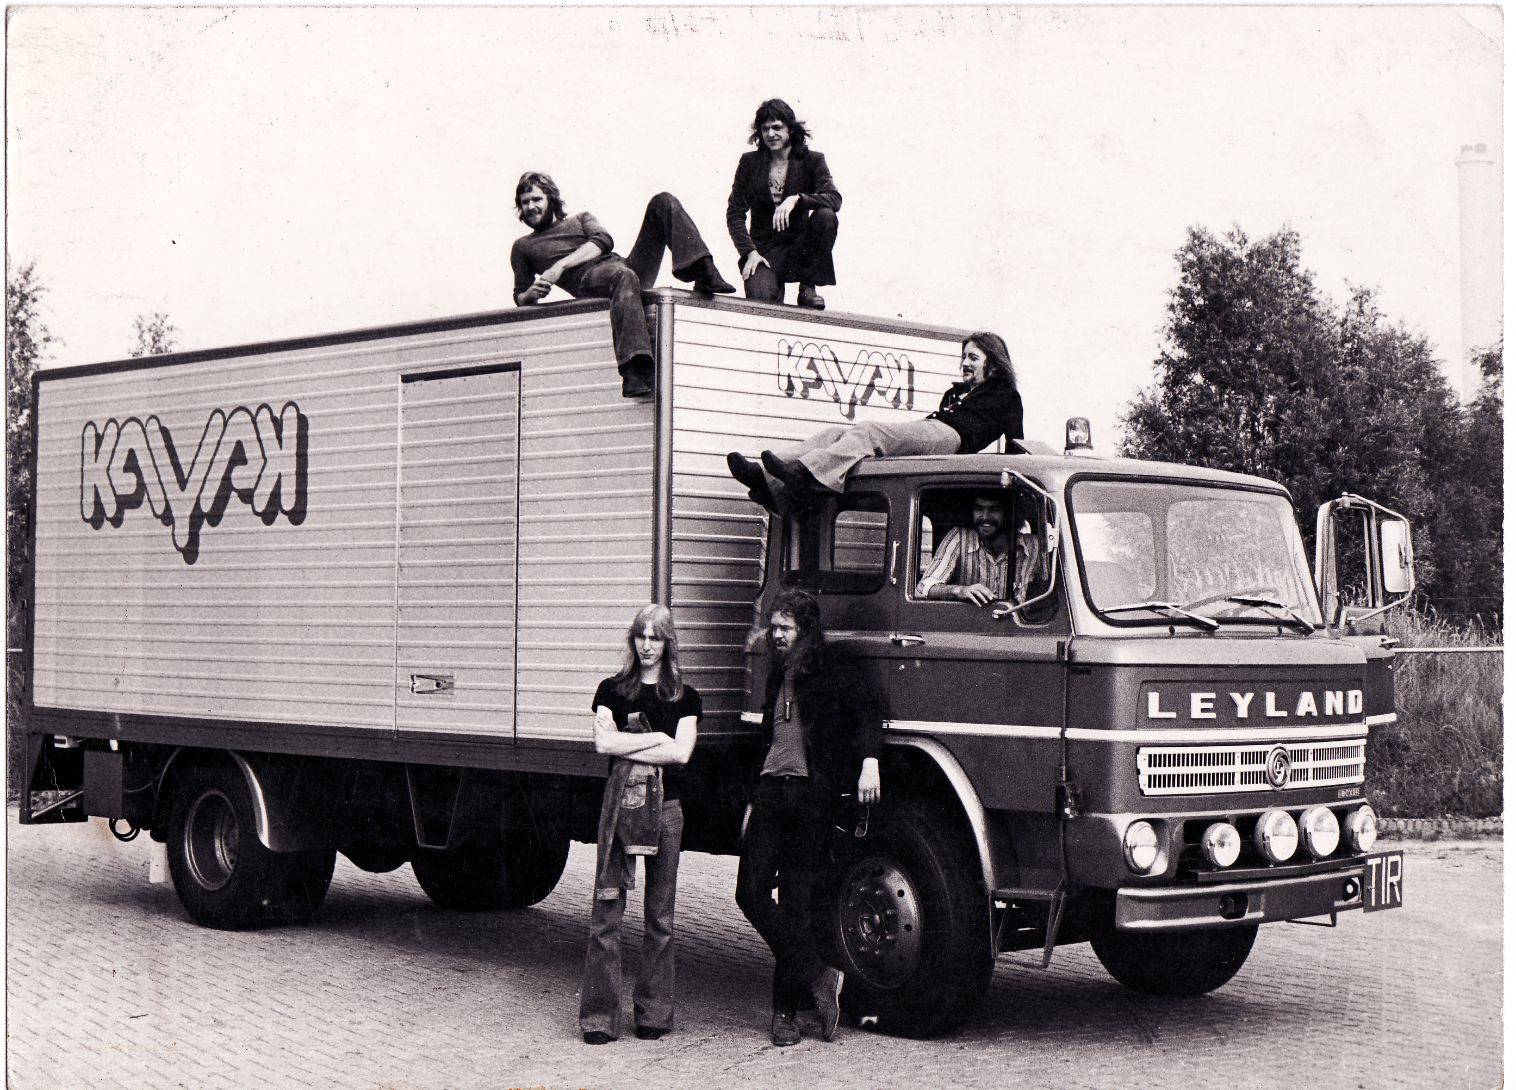 KAYAK Nederlandse popgroep